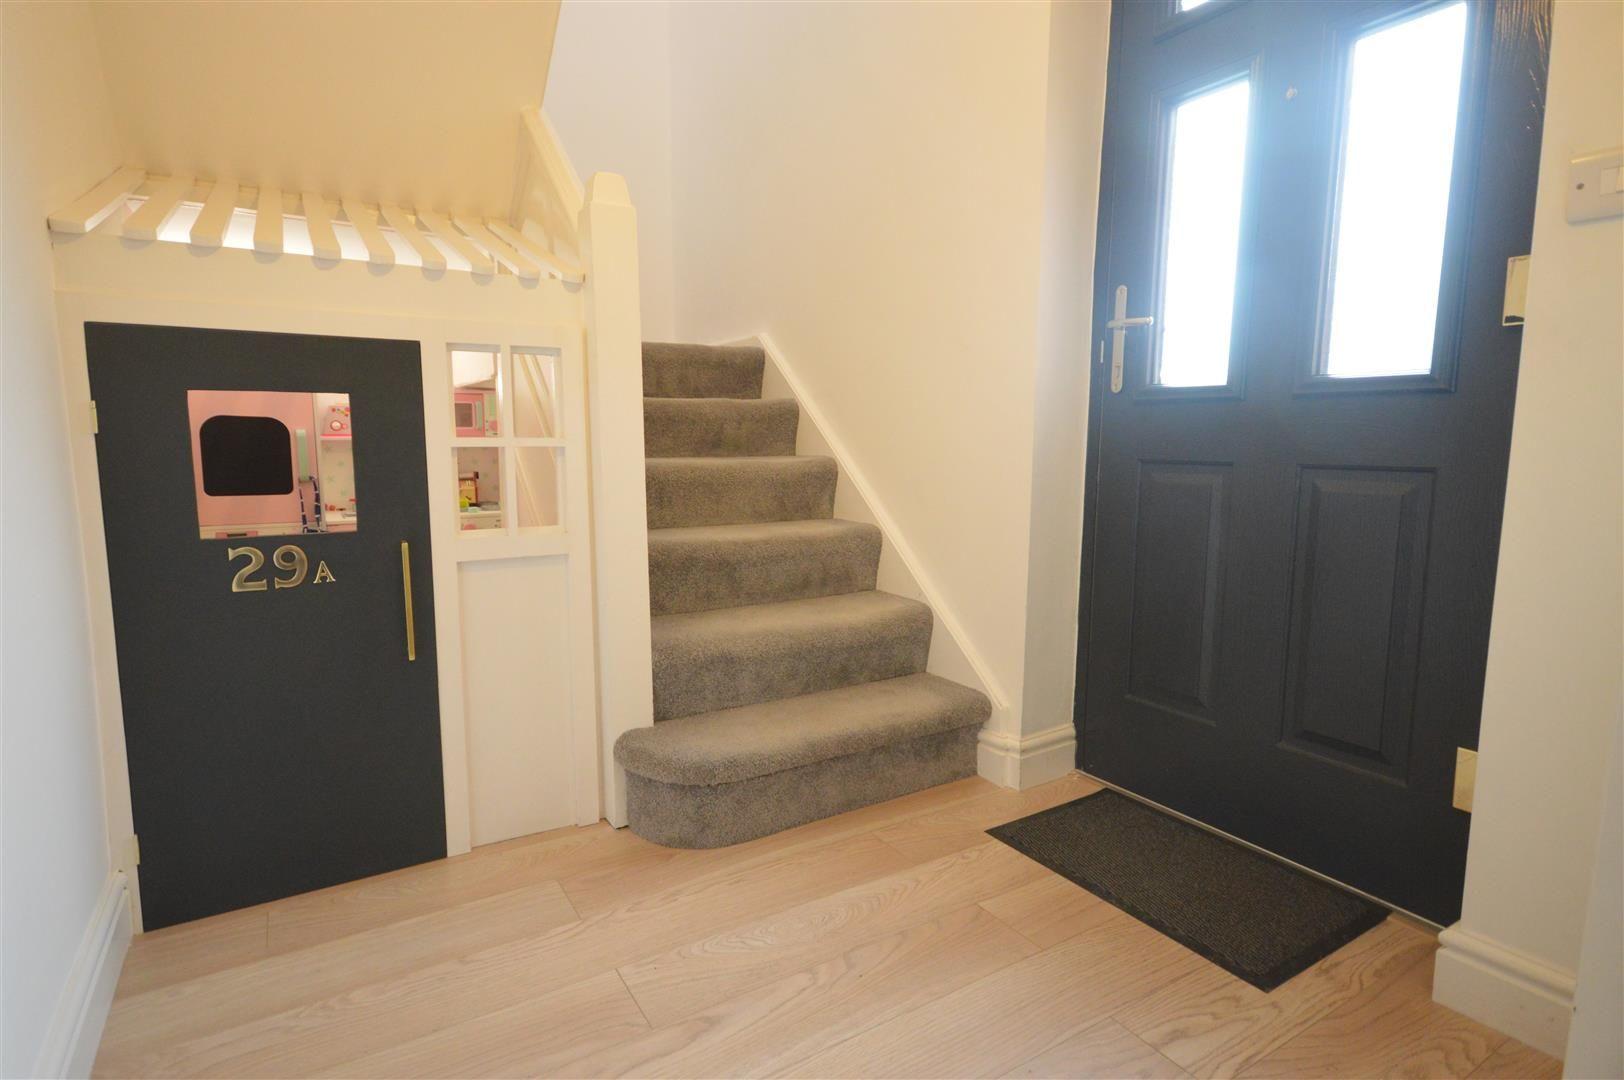 5 bed detached for sale in Leominster  - Property Image 8